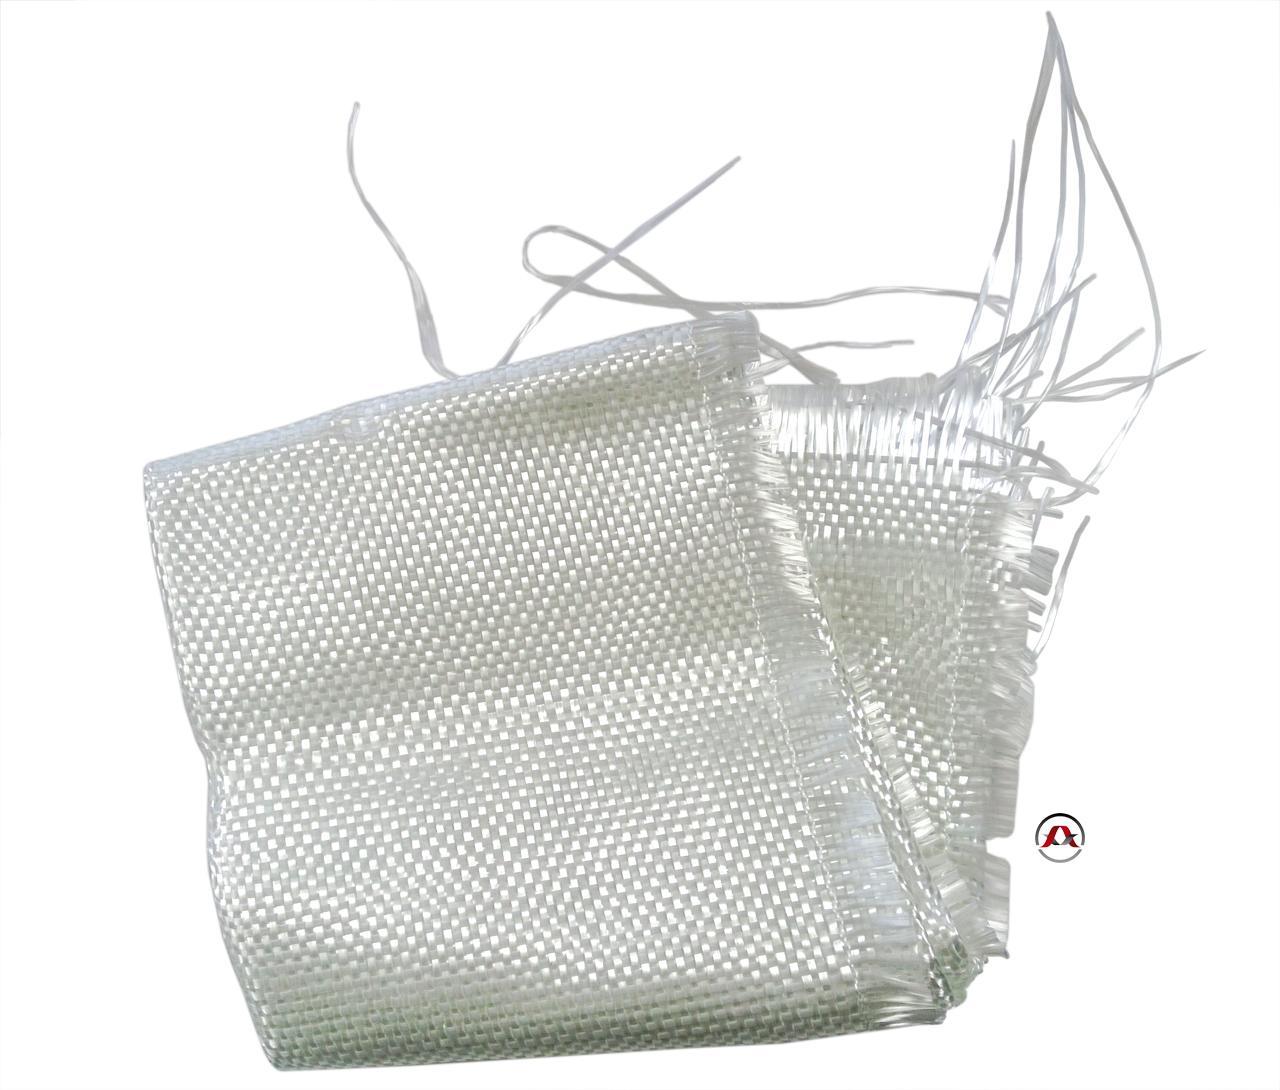 renovation et preparation adnautomid fibre de verre tisse. Black Bedroom Furniture Sets. Home Design Ideas